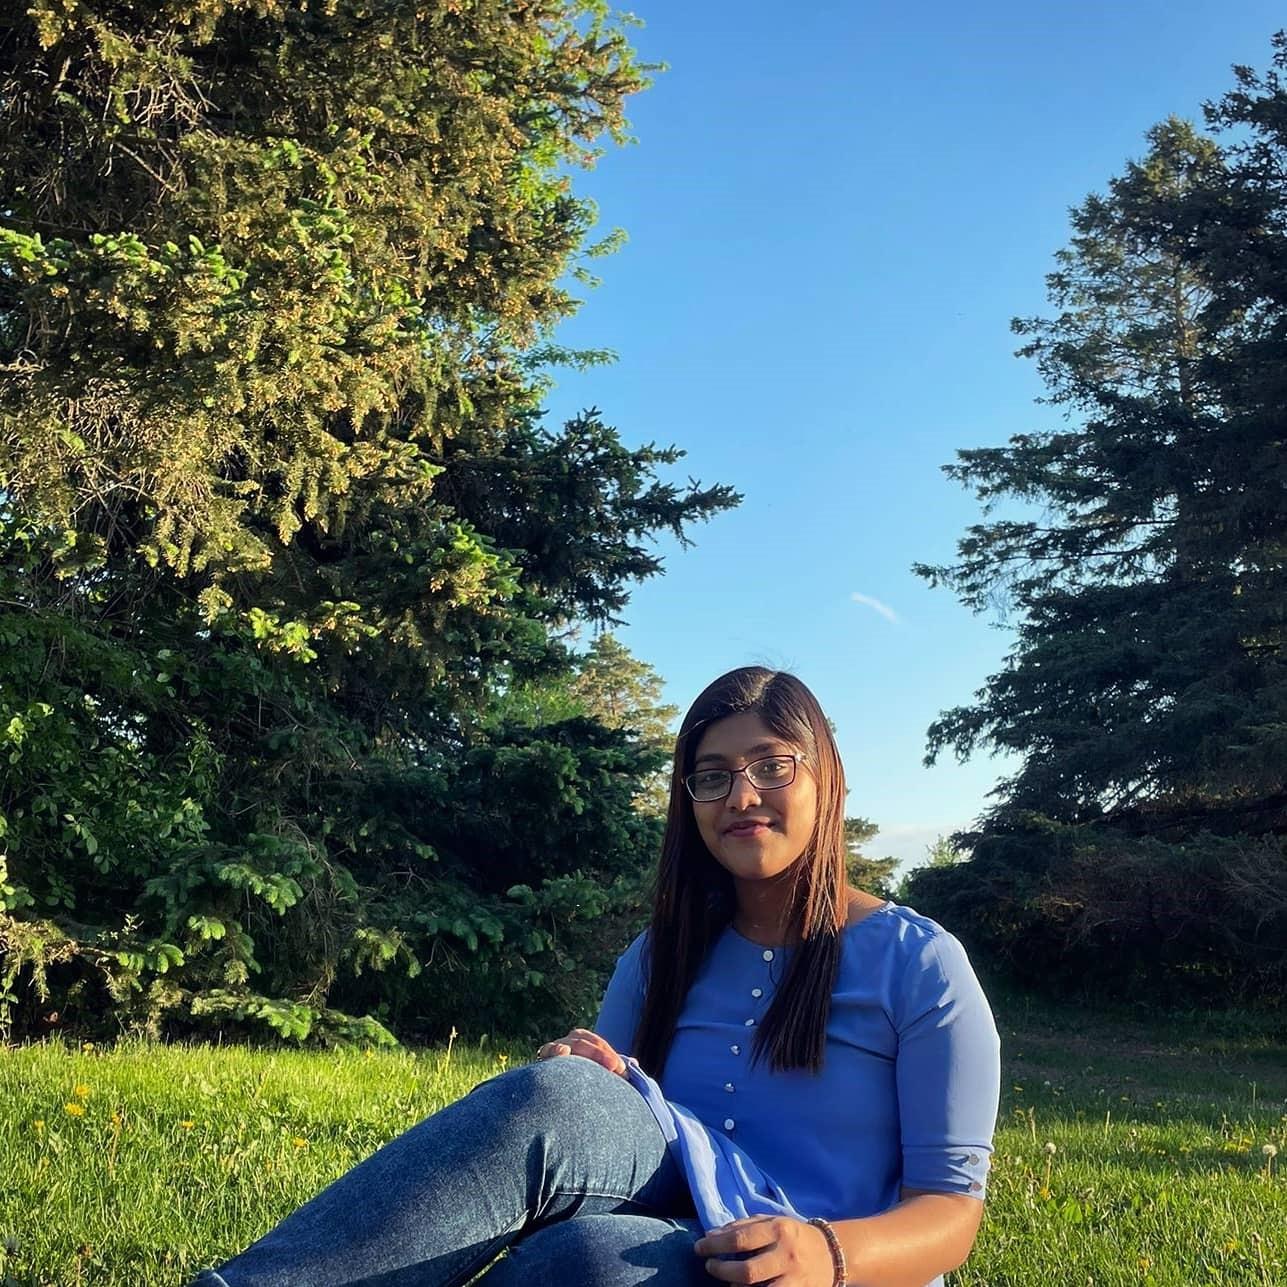 Priyanka sitting on the grass